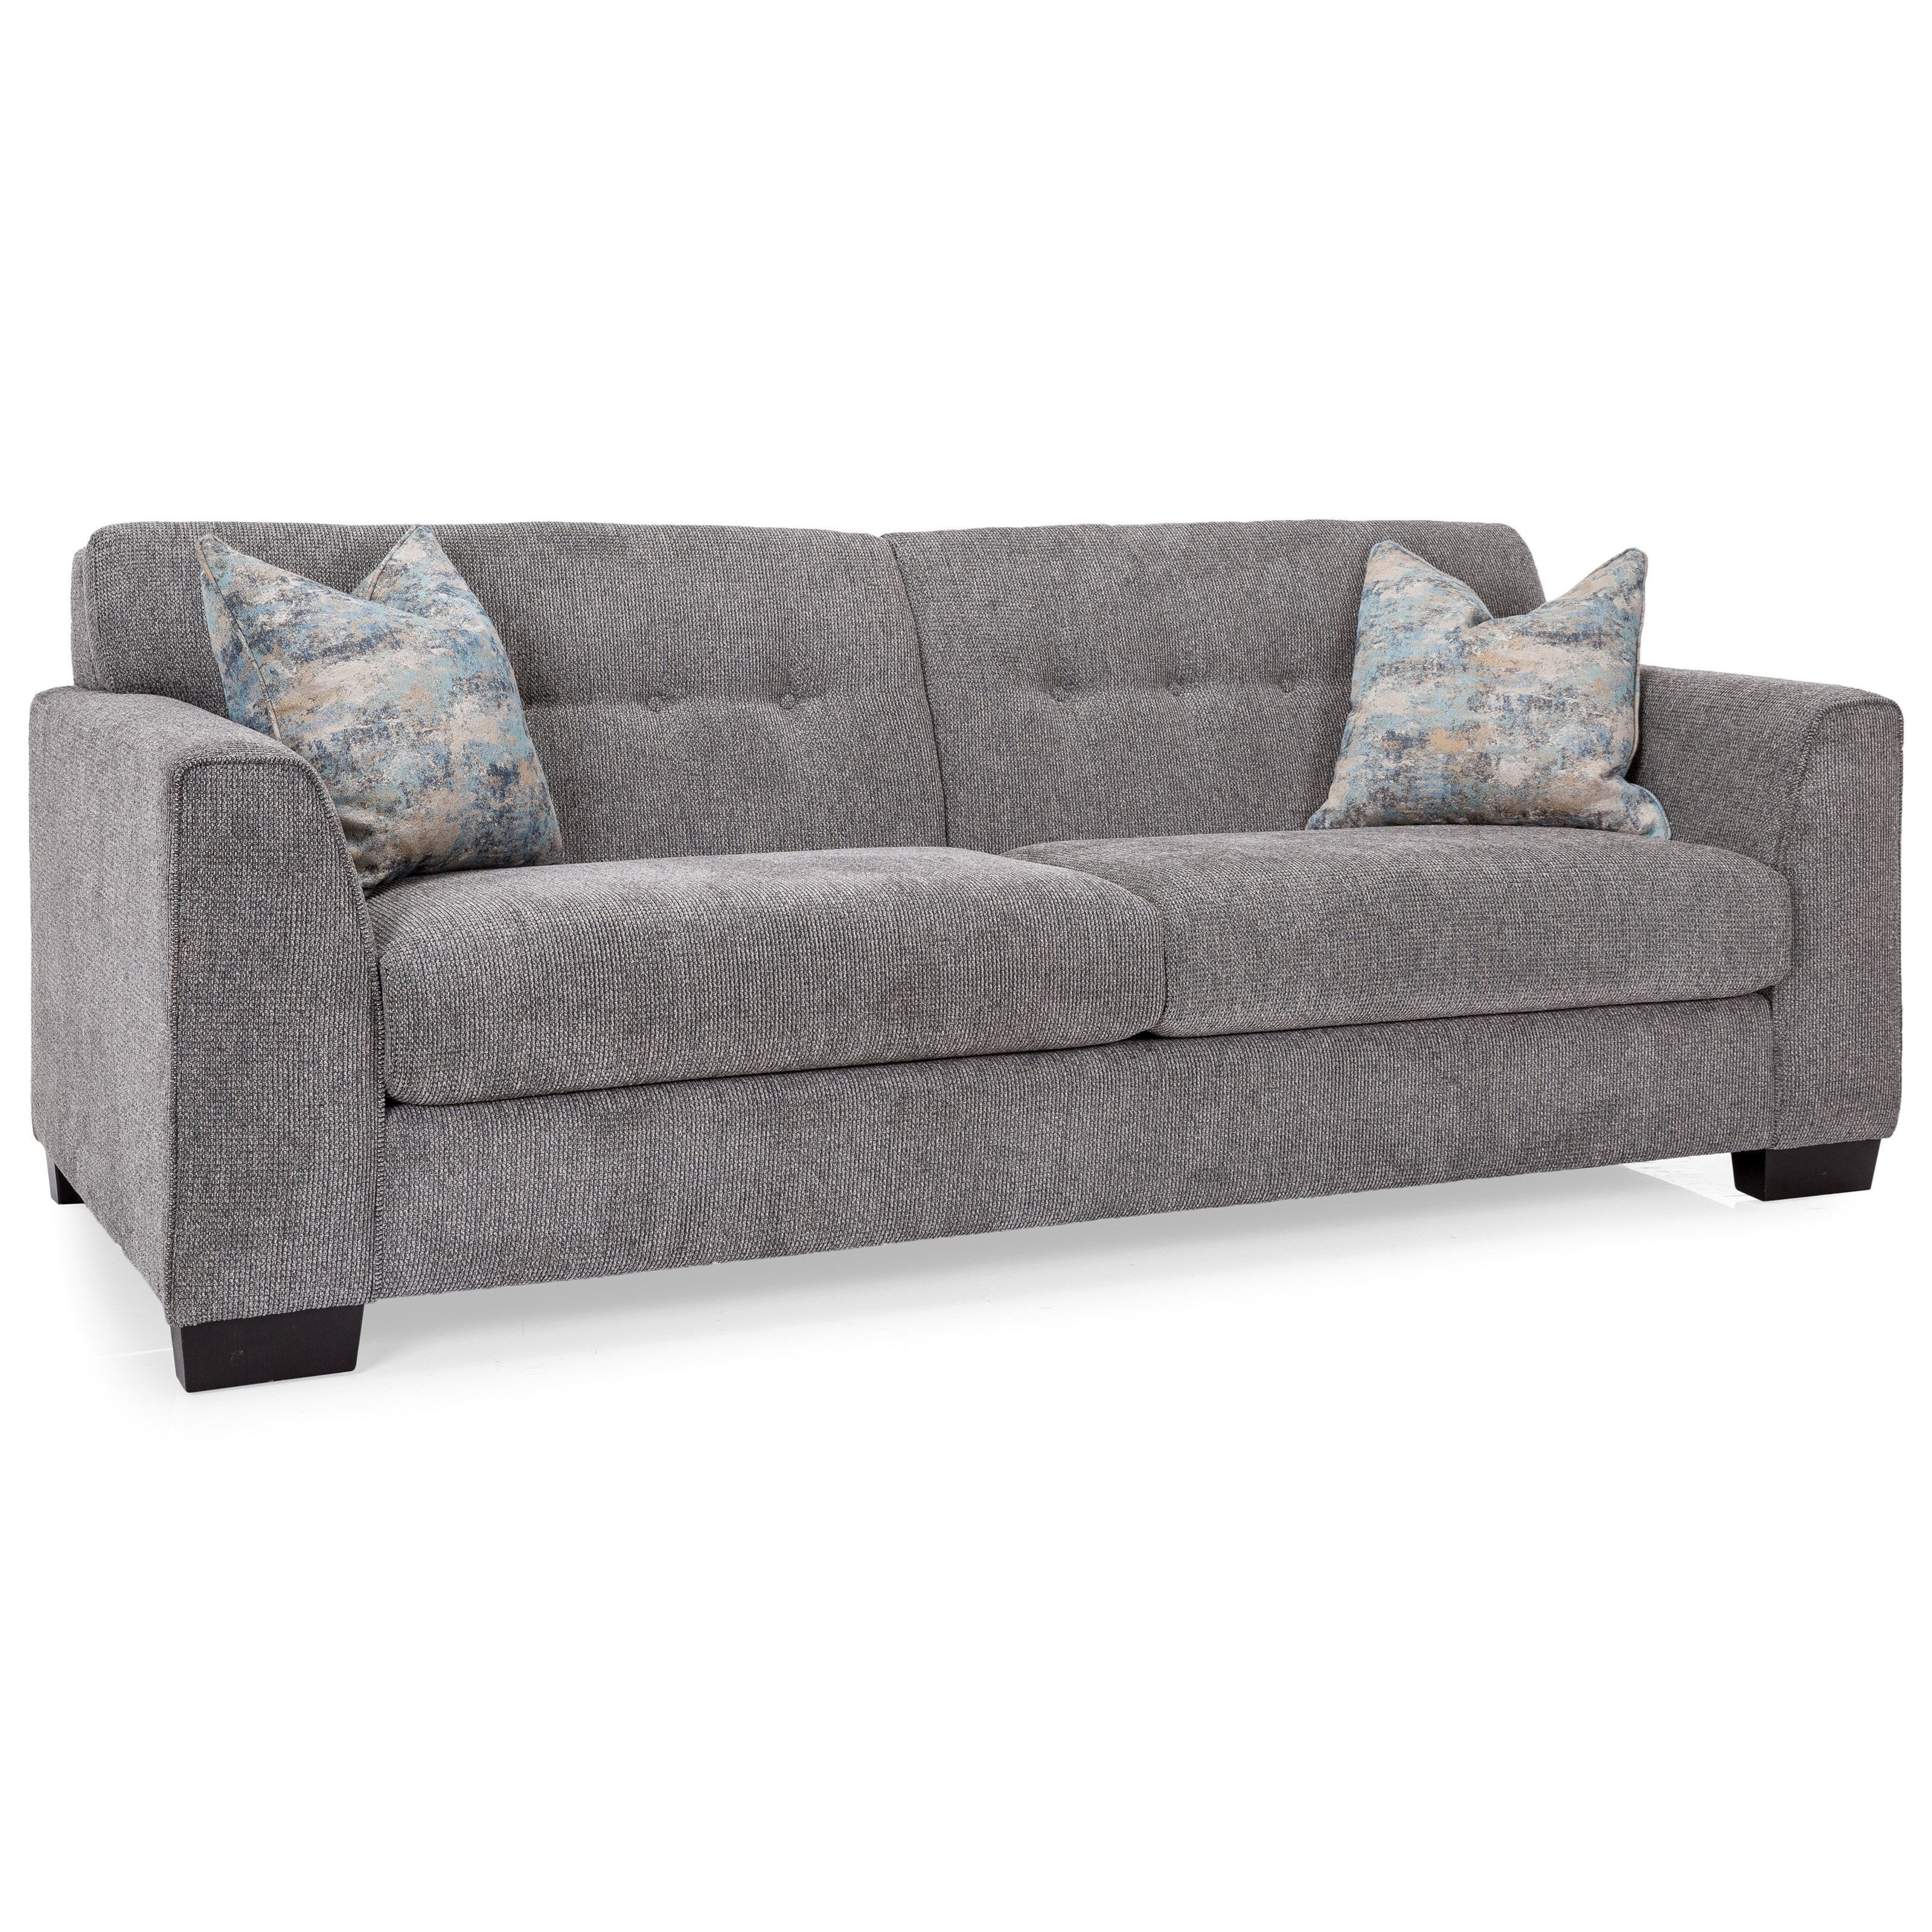 2713 Sofa by Decor-Rest at Johnny Janosik